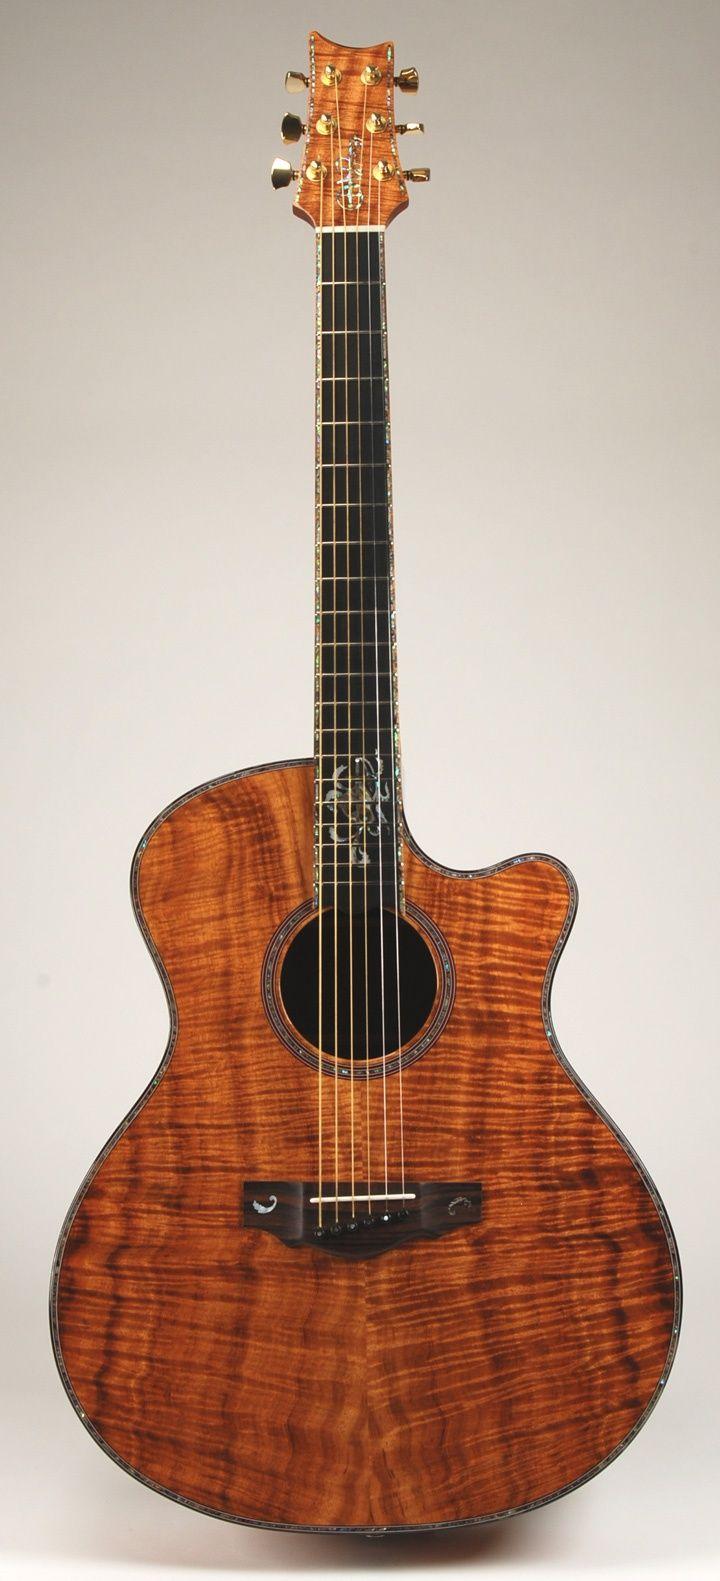 warrior custom shop acoustic beautiful acoustic guitars guitar acoustic acoustic guitar. Black Bedroom Furniture Sets. Home Design Ideas